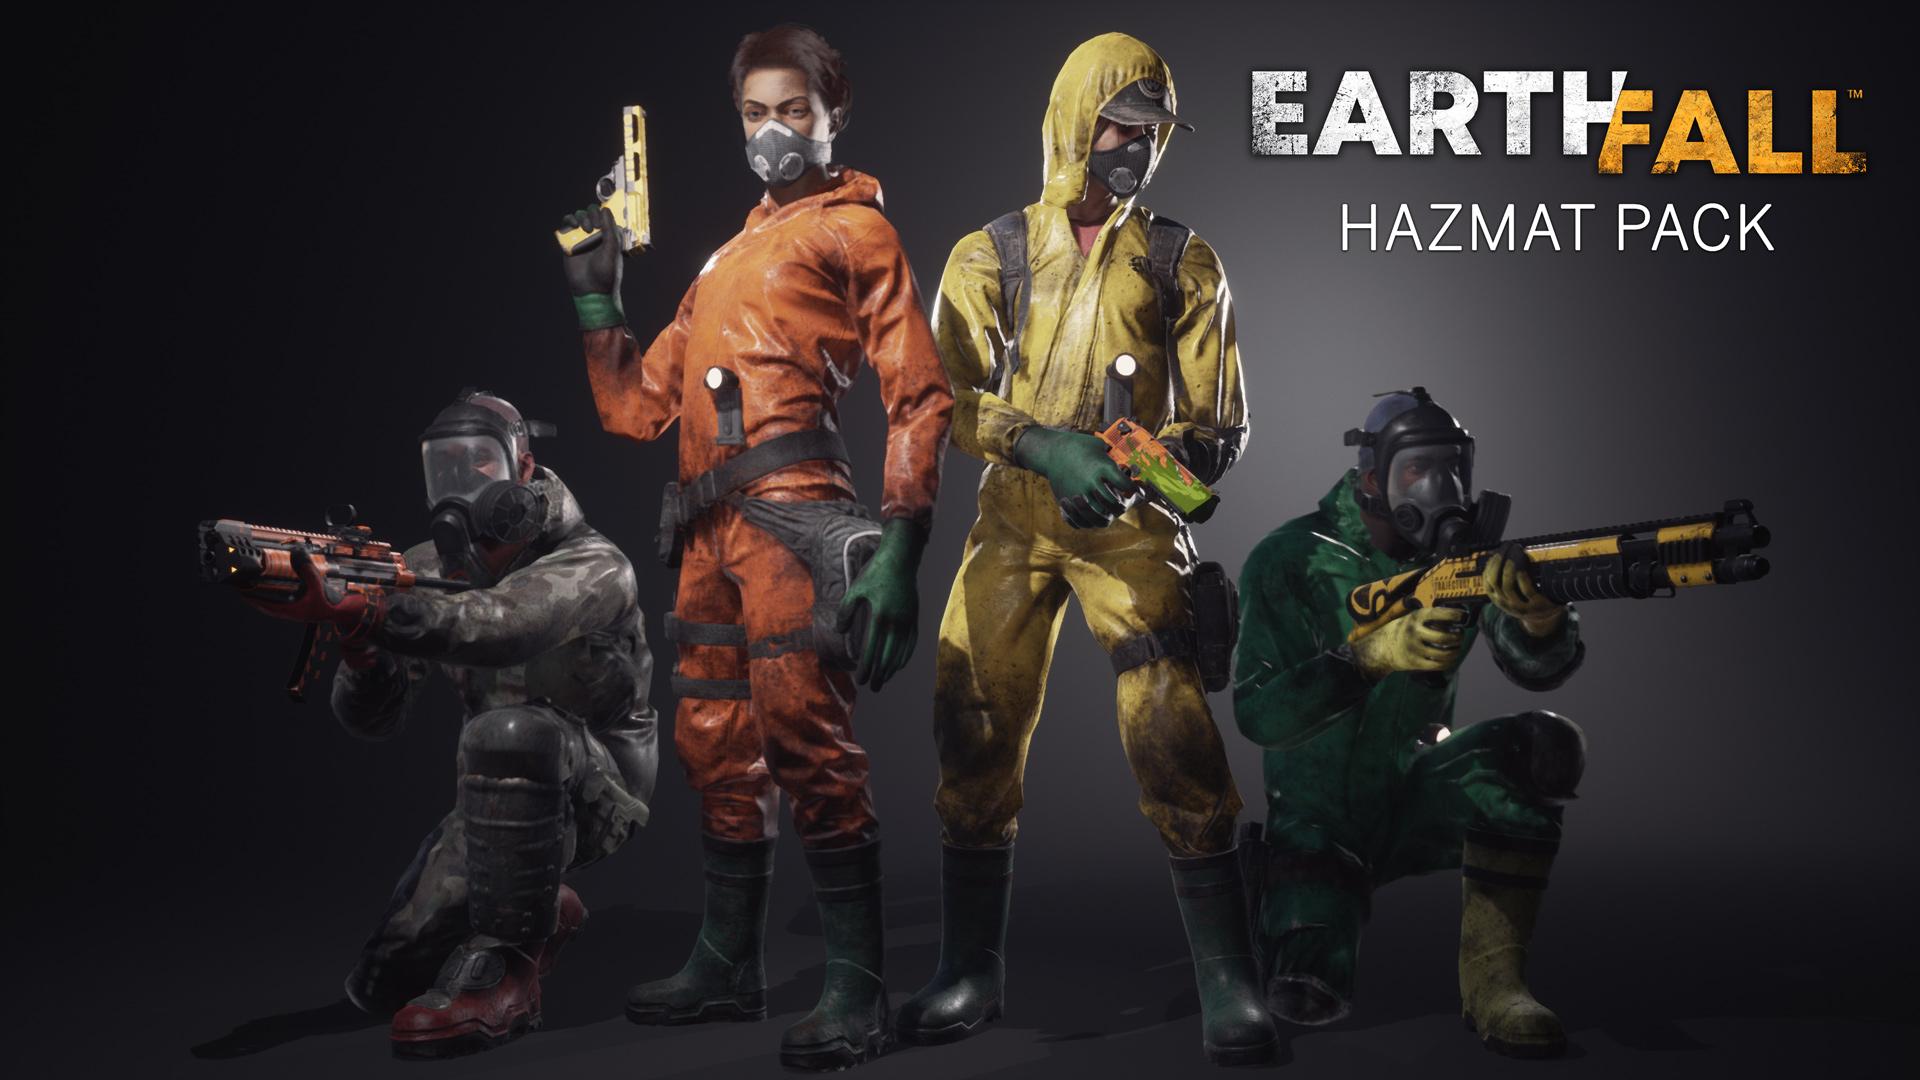 Earthfall™ Hazmat Pack